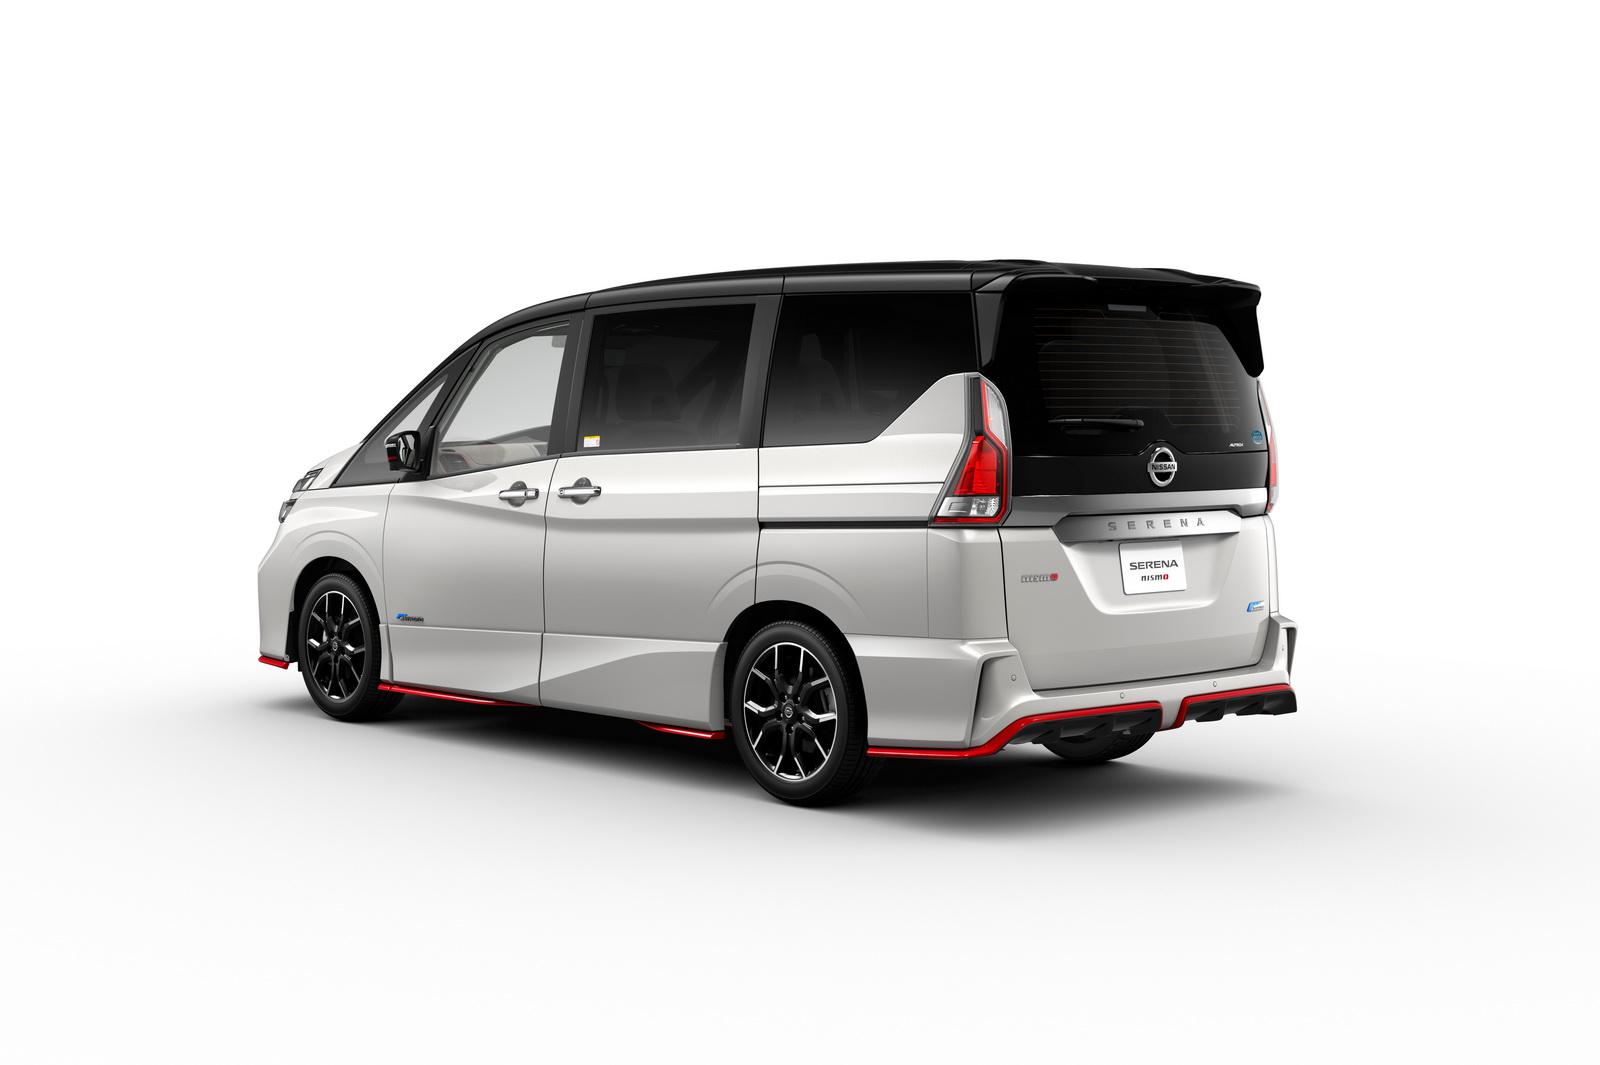 Nissan_Serena_Nismo_03